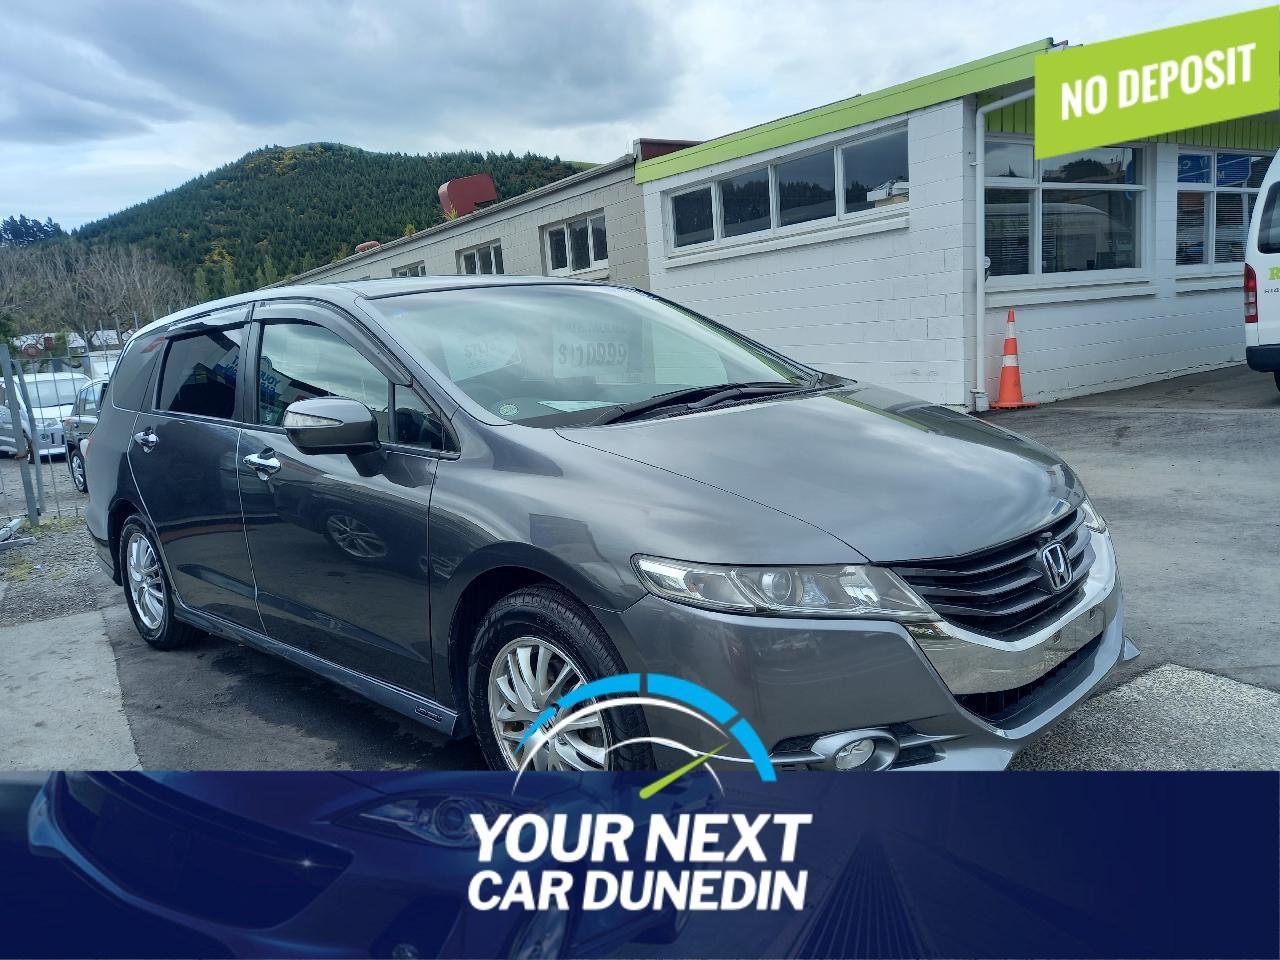 image-0, 2010 Honda Odyssey Aero 7 Seats No Deposit Finance at Dunedin